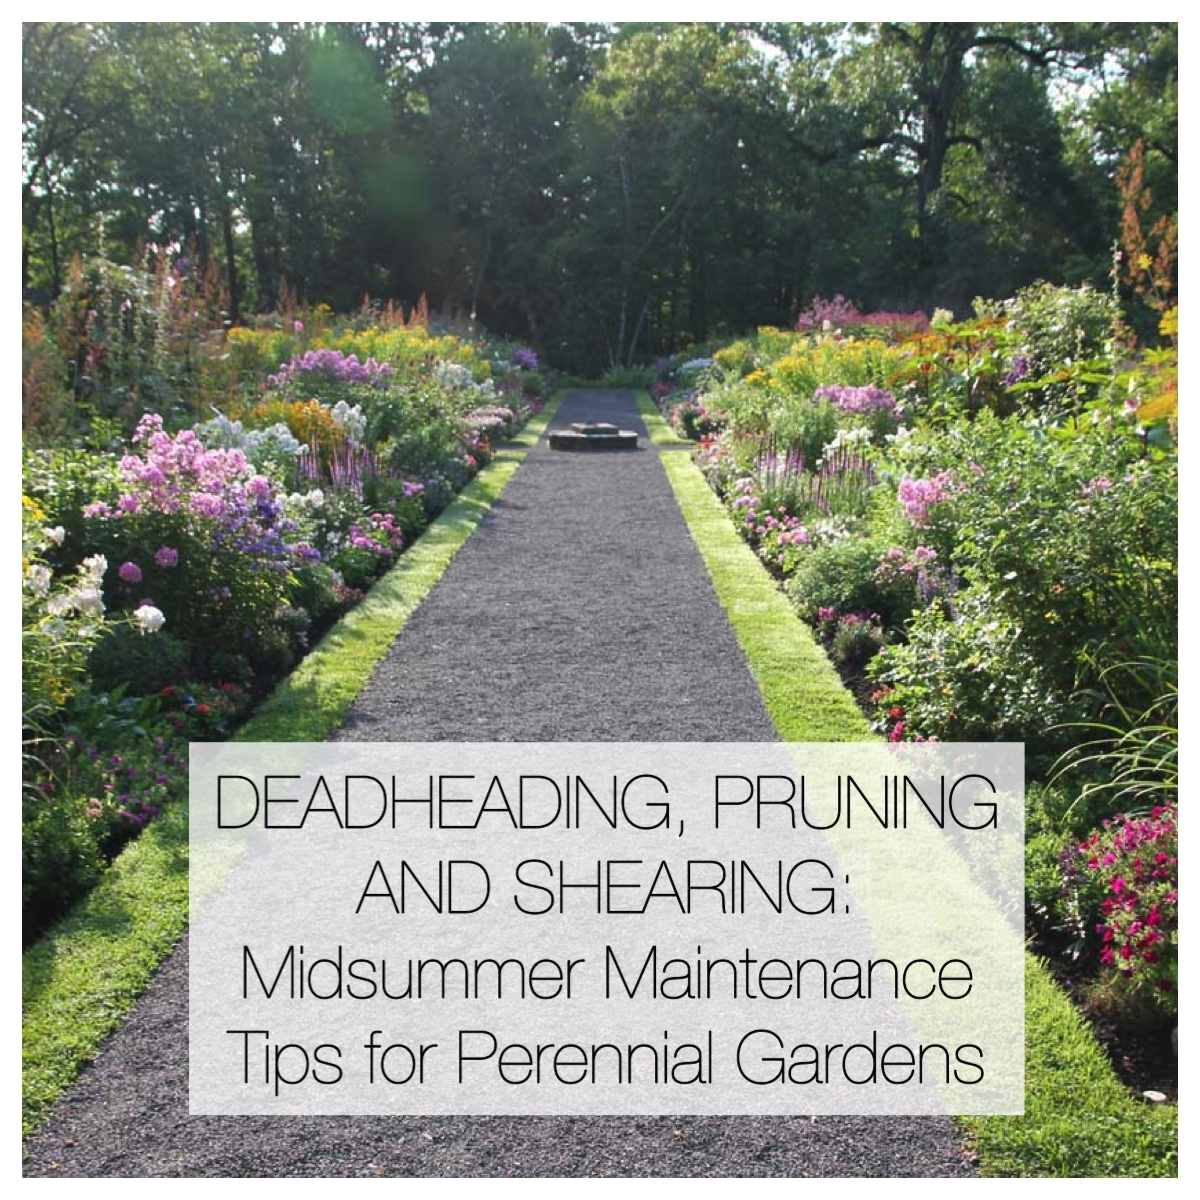 Midsummer maintenance tips for perennial gardens for Perennial garden maintenance